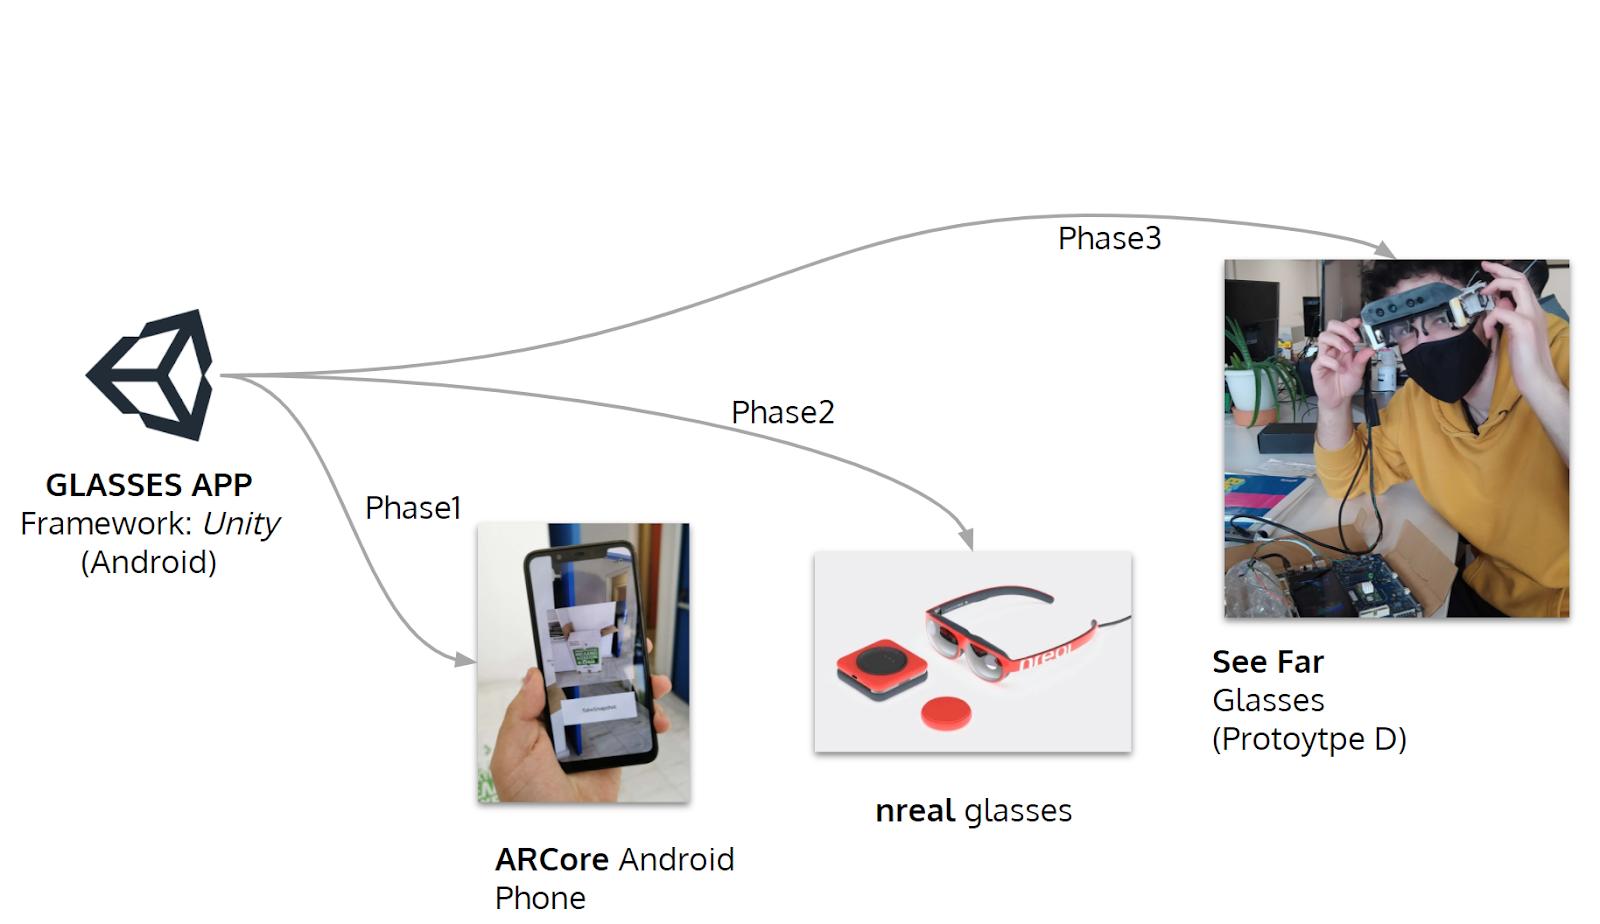 glasses app Framework unity android